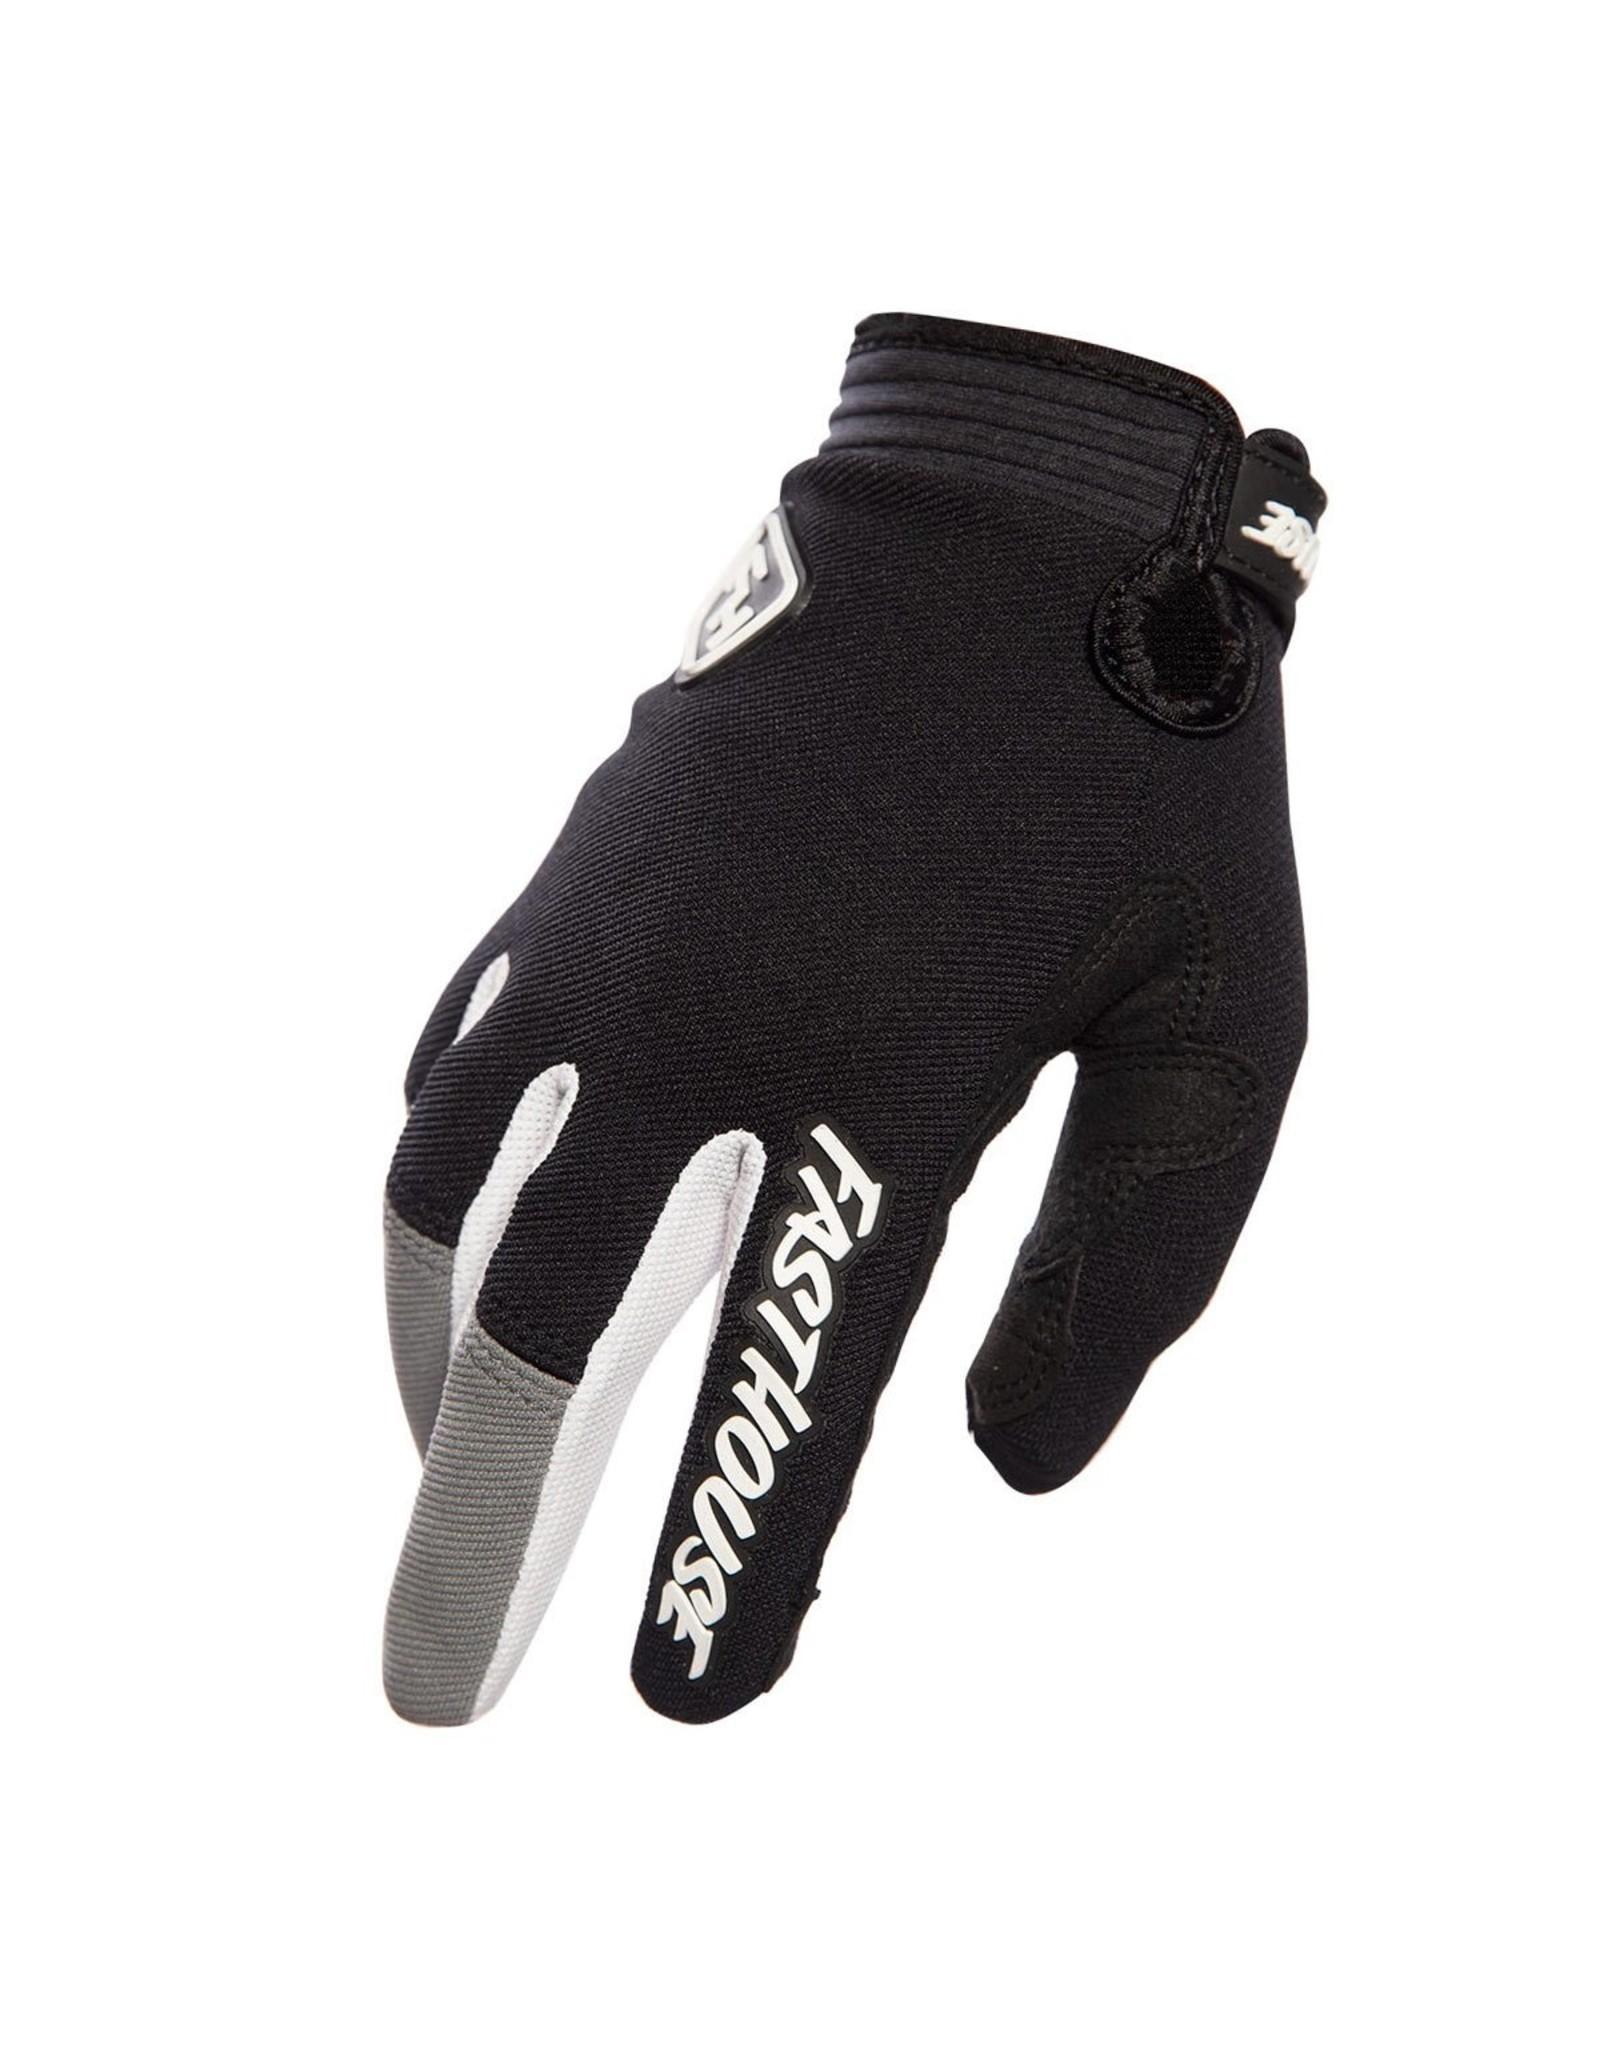 Fasthouse Fasthouse Speed Style Ridgeline Glove Black